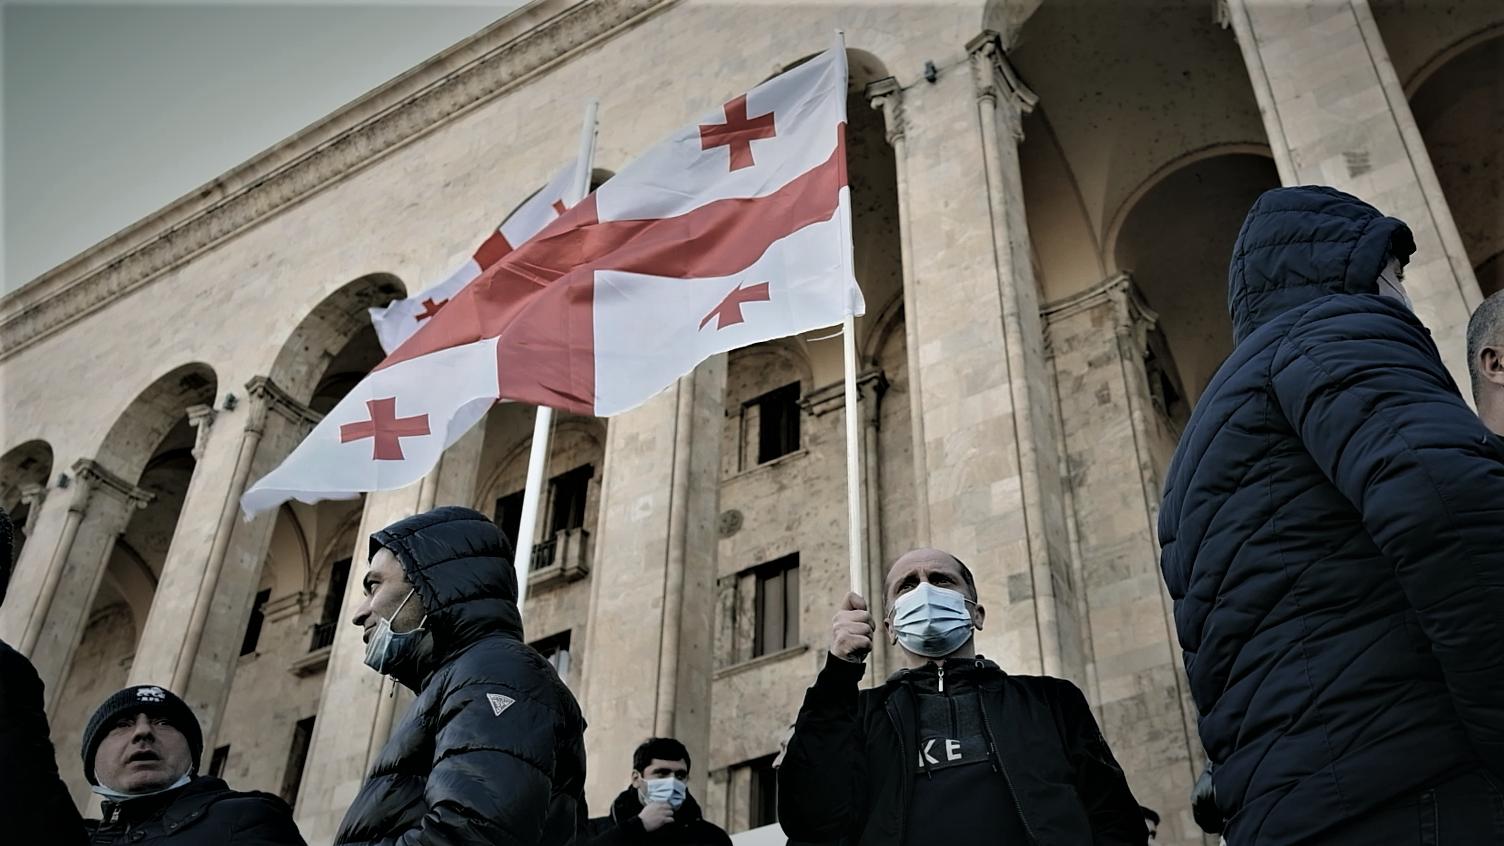 3525232 #политика featured, Бидзина Иванишвили, Грузинская мечта, кризис Мечты, Ника Мелия